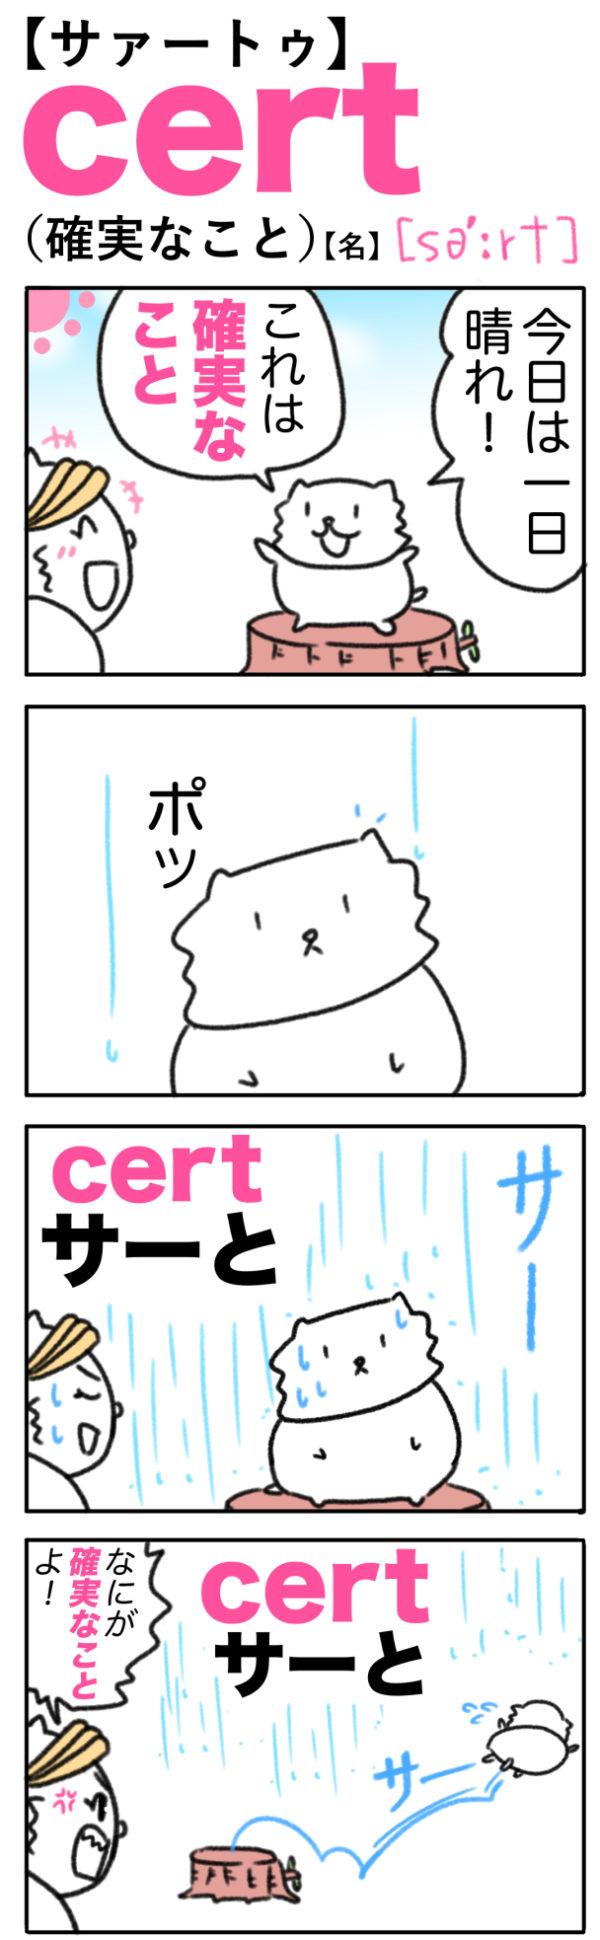 cert(確実なこと)の語呂合わせ英単語